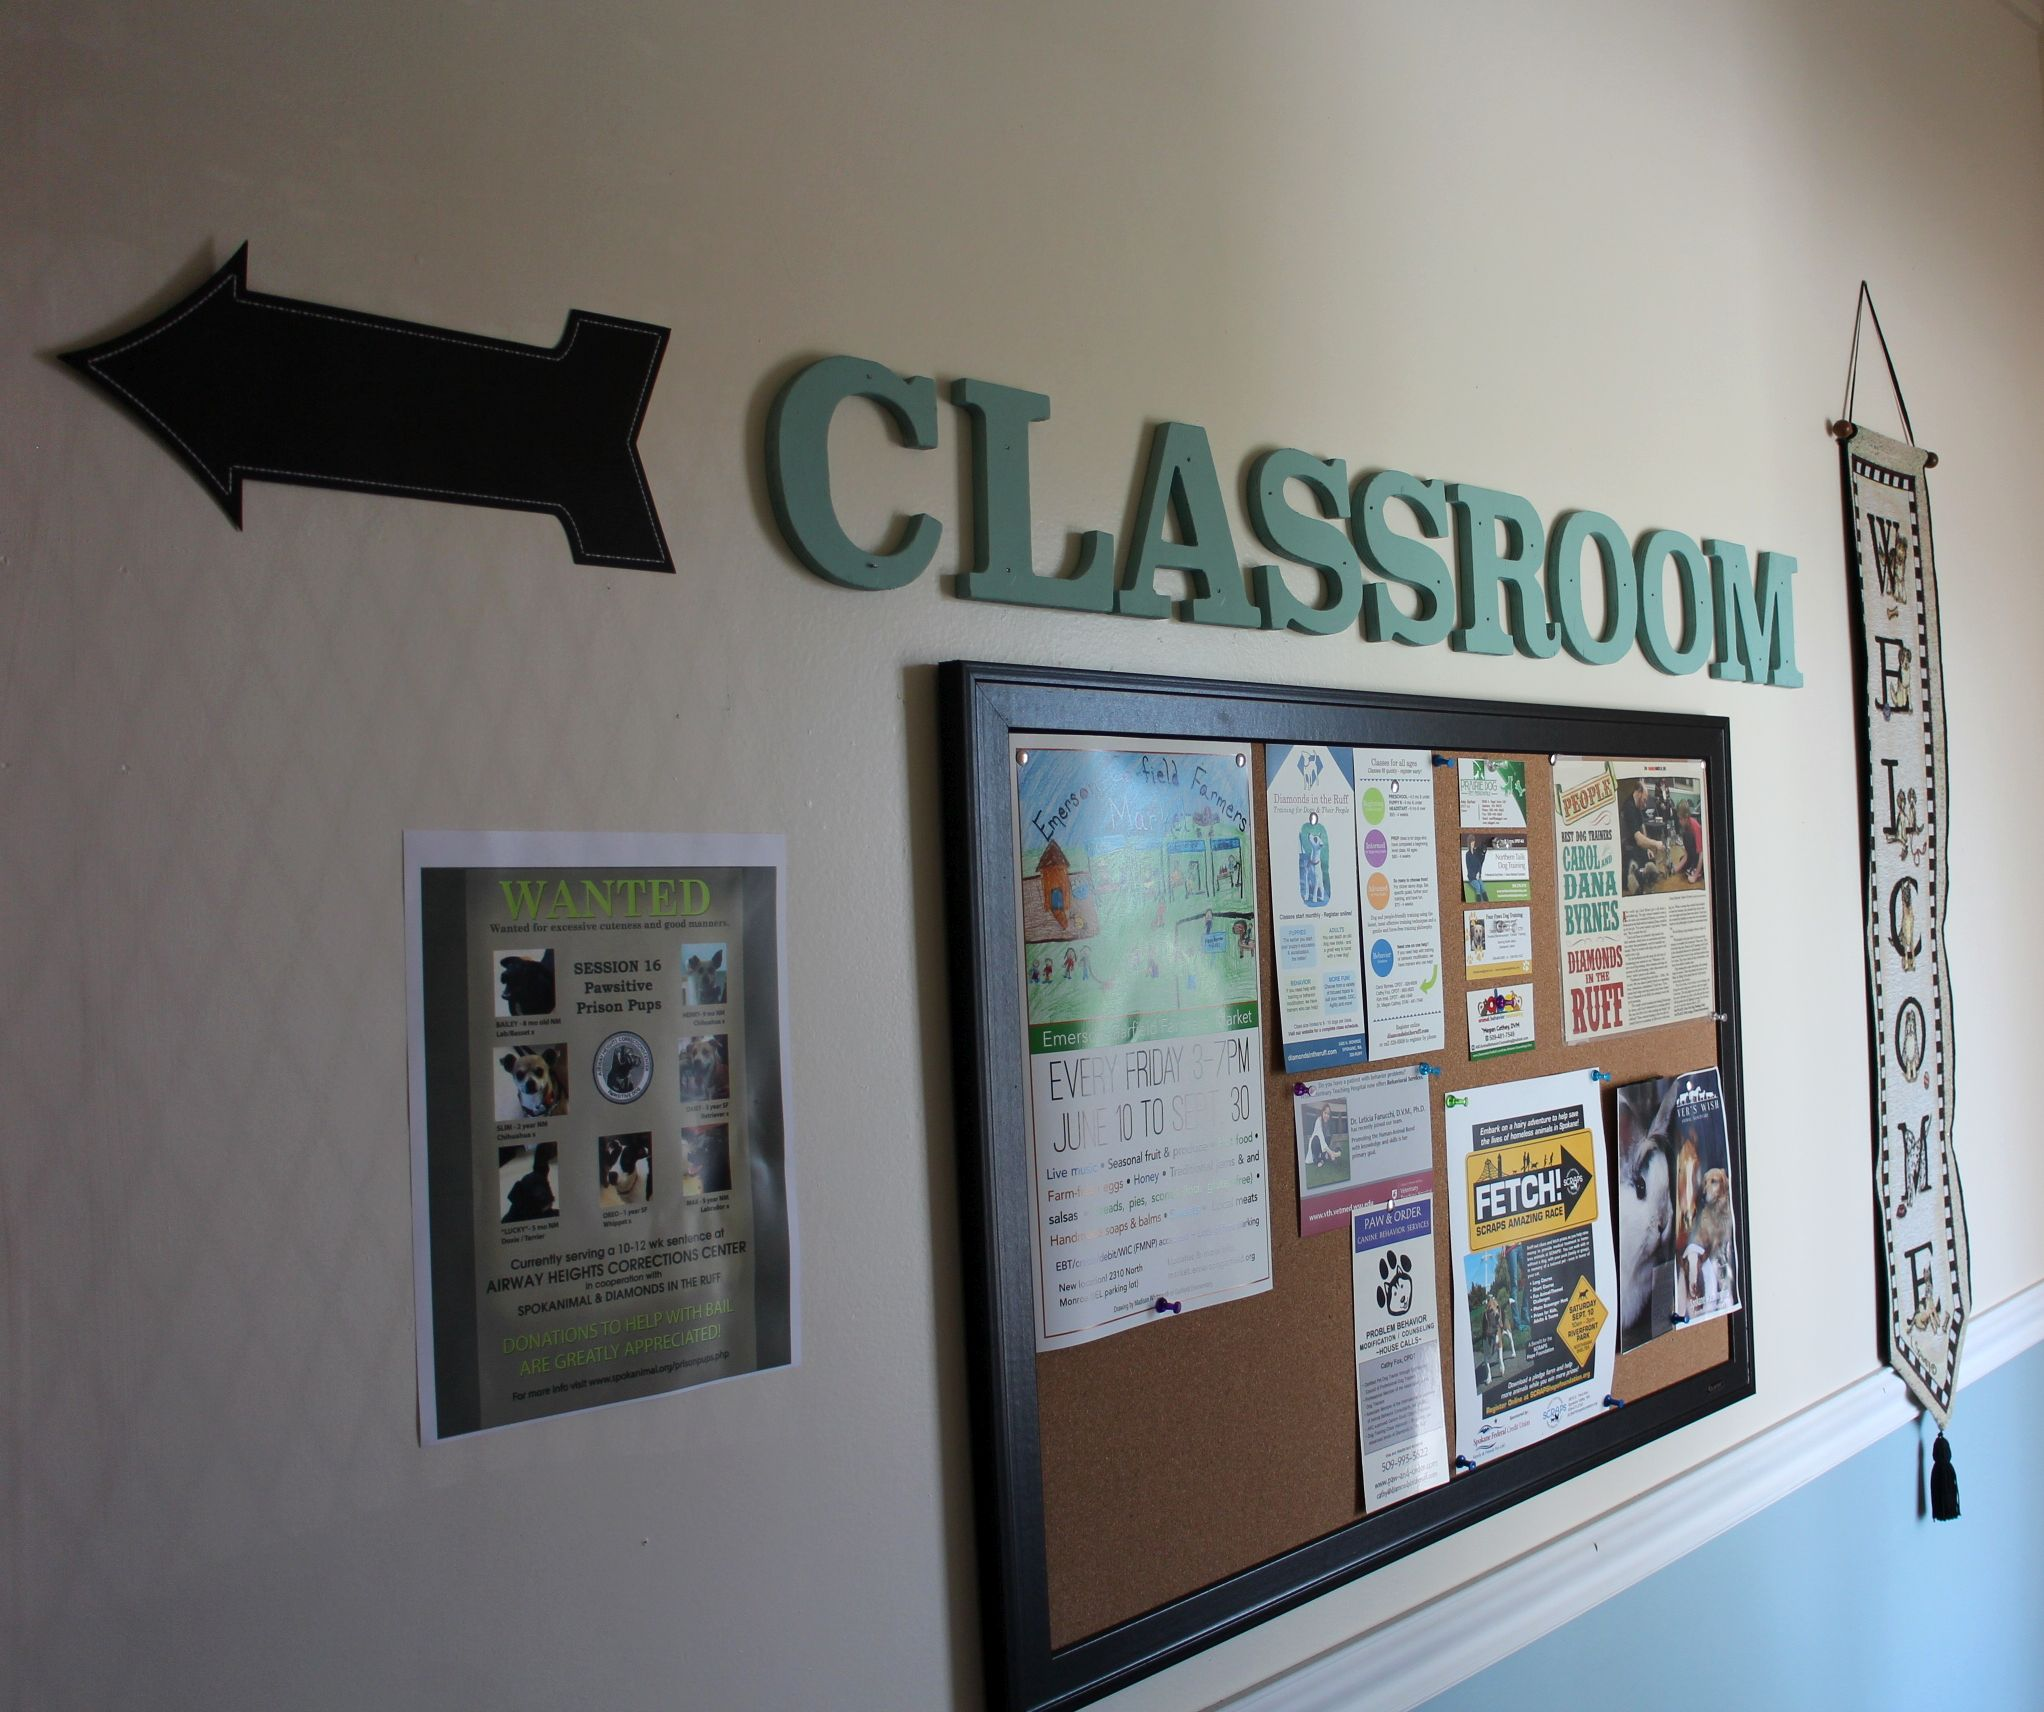 Classroom this way